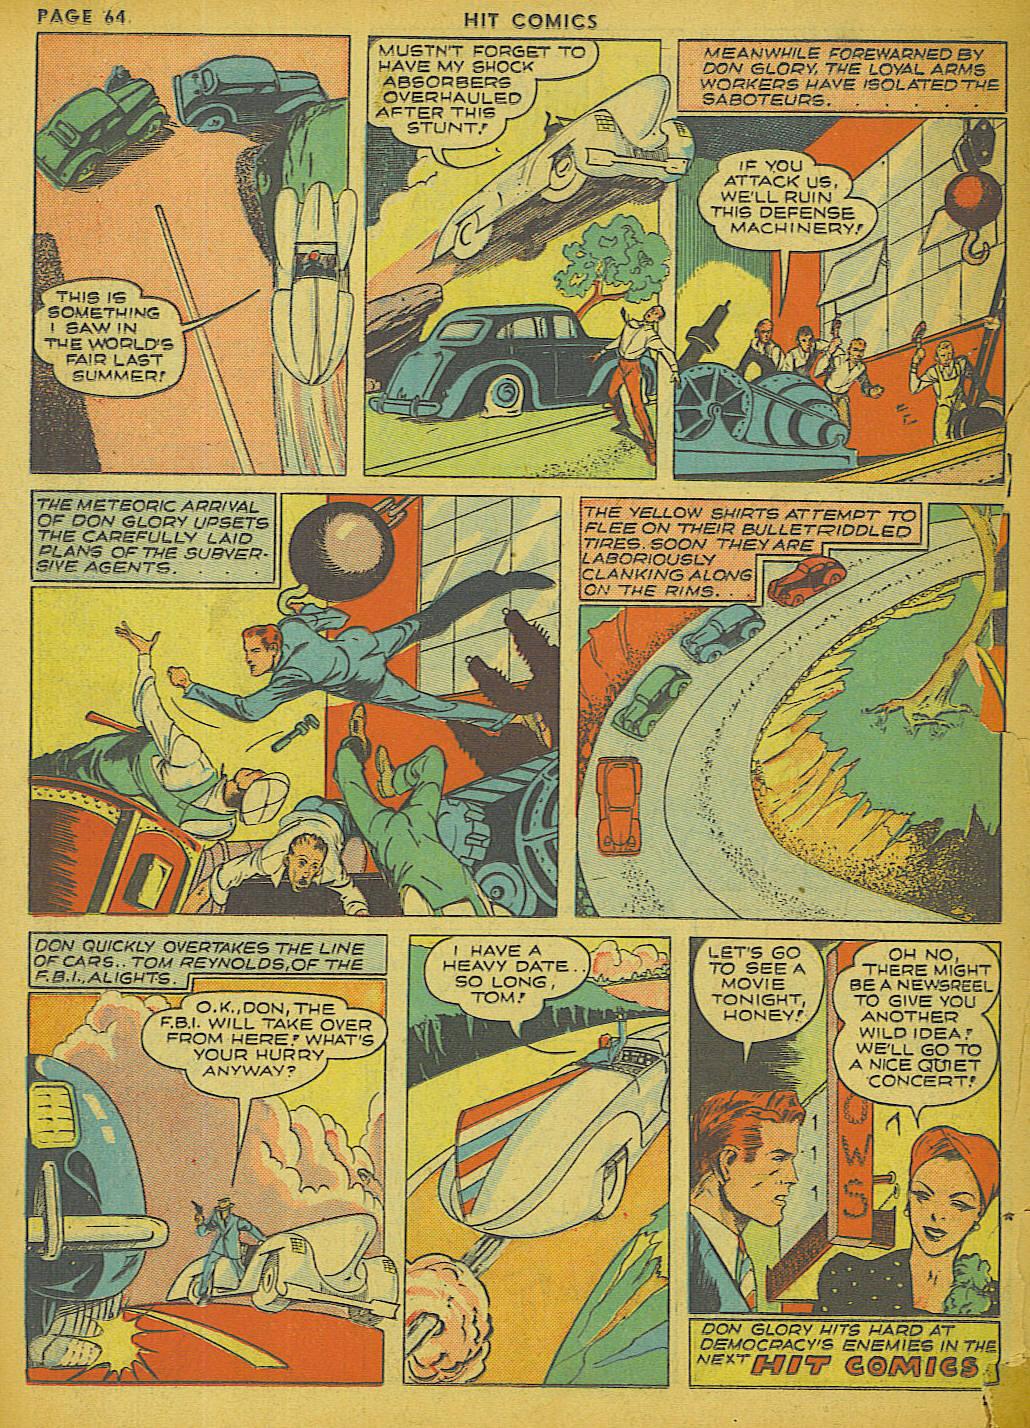 Read online Hit Comics comic -  Issue #13 - 66